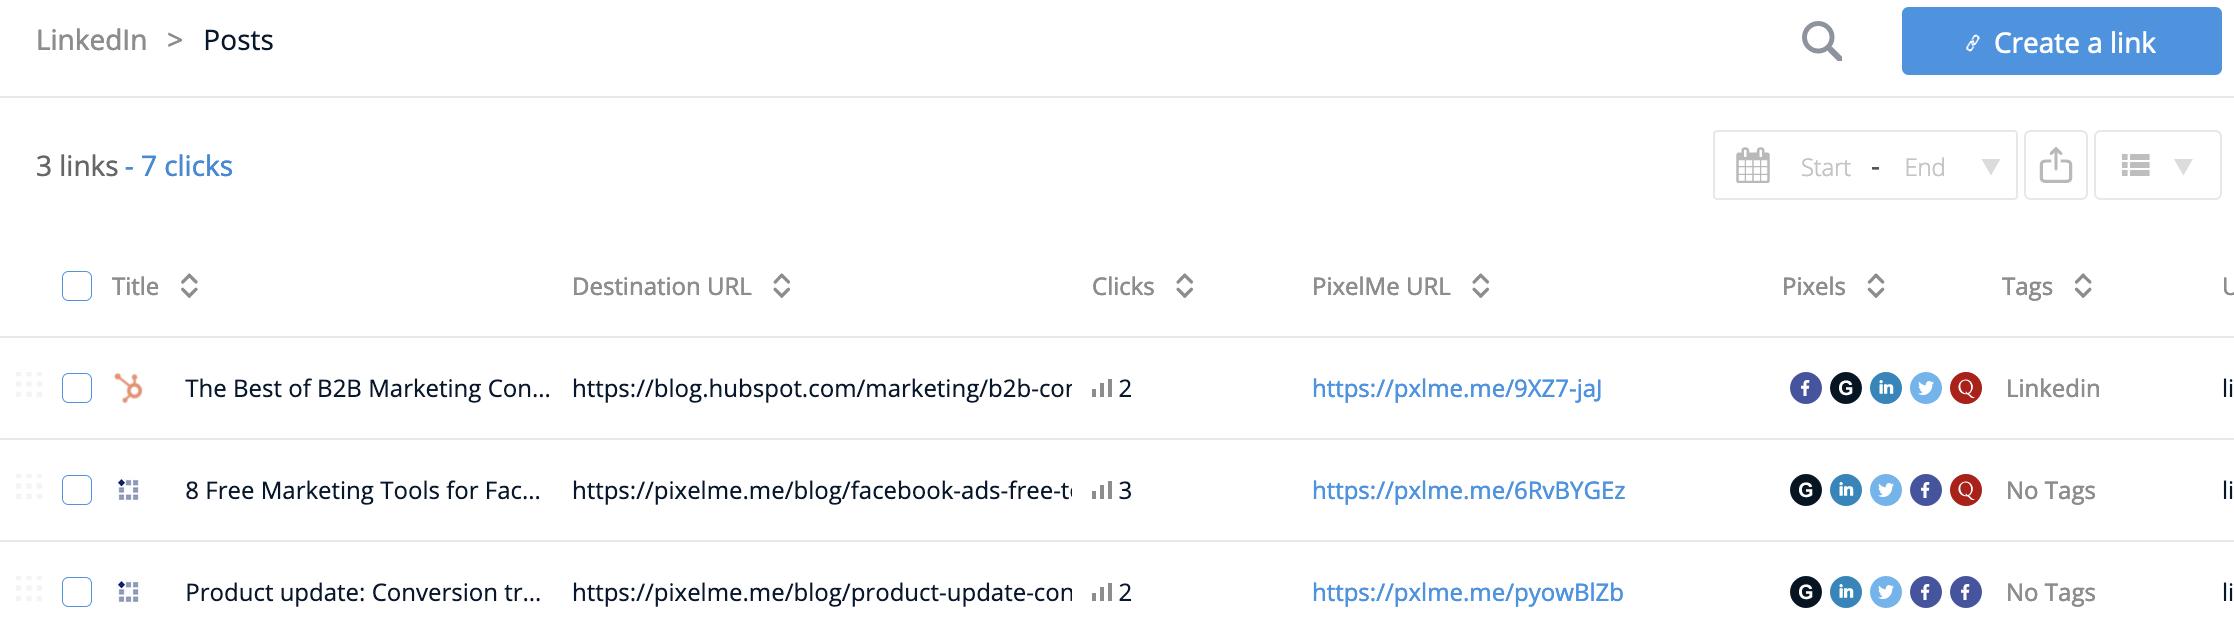 PixelMe links with clicks